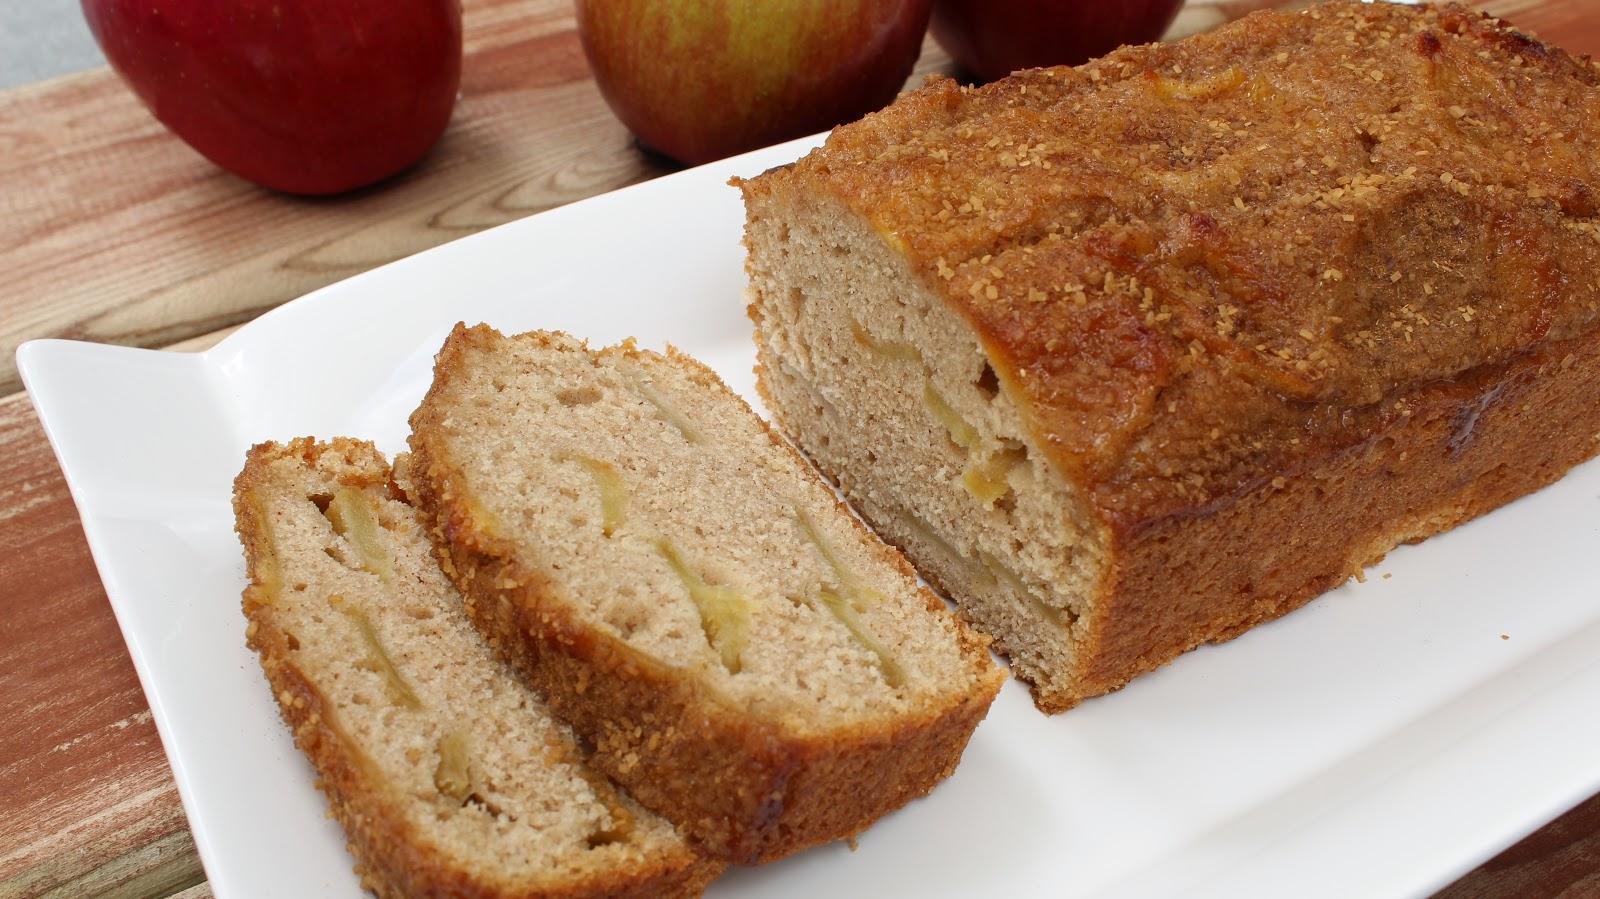 Caramelized Apple Bread with Cinnamon Sugar